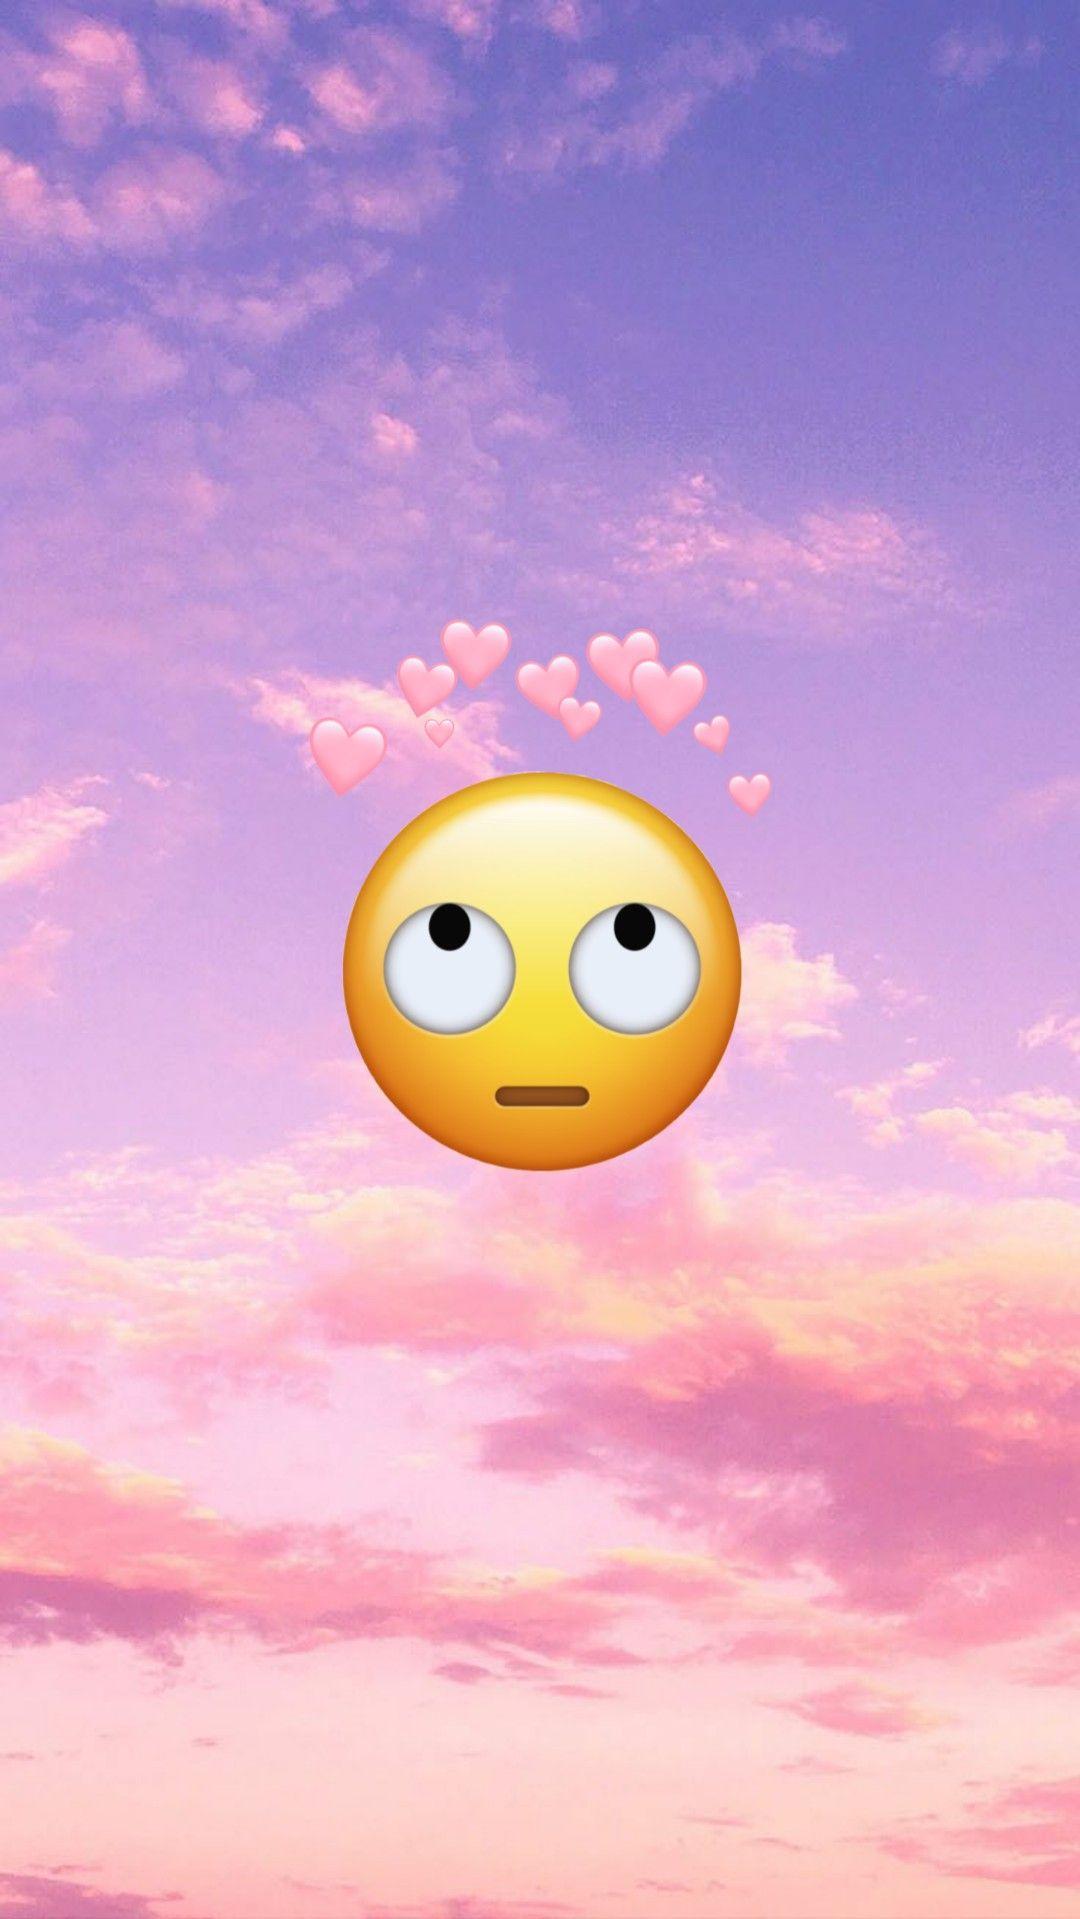 Idea by Daniisha Gianina on Emoji Cute emoji wallpaper